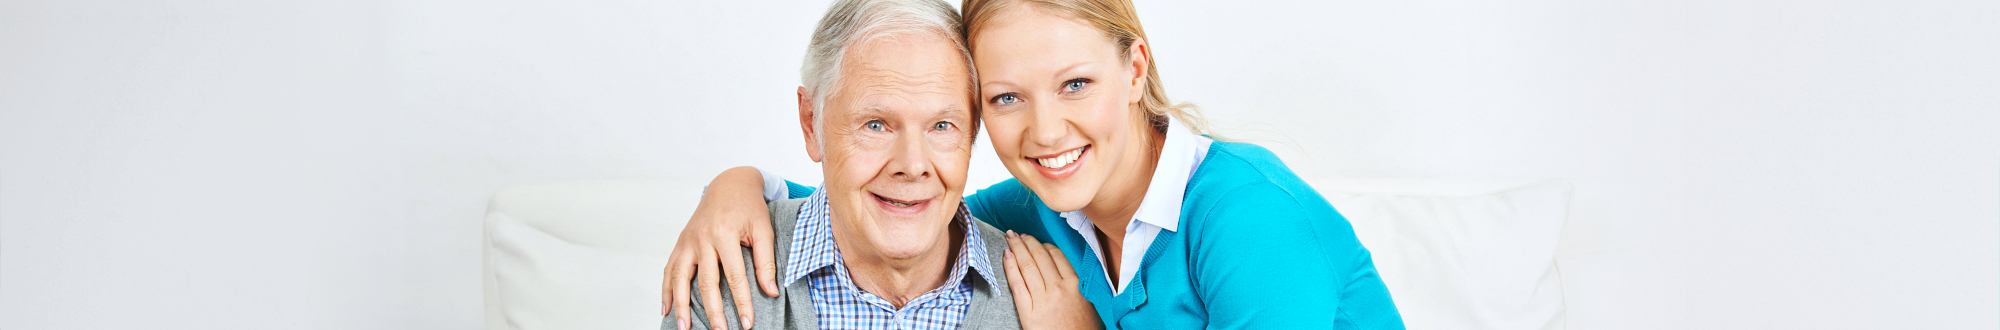 portrait of senior man and caregiver